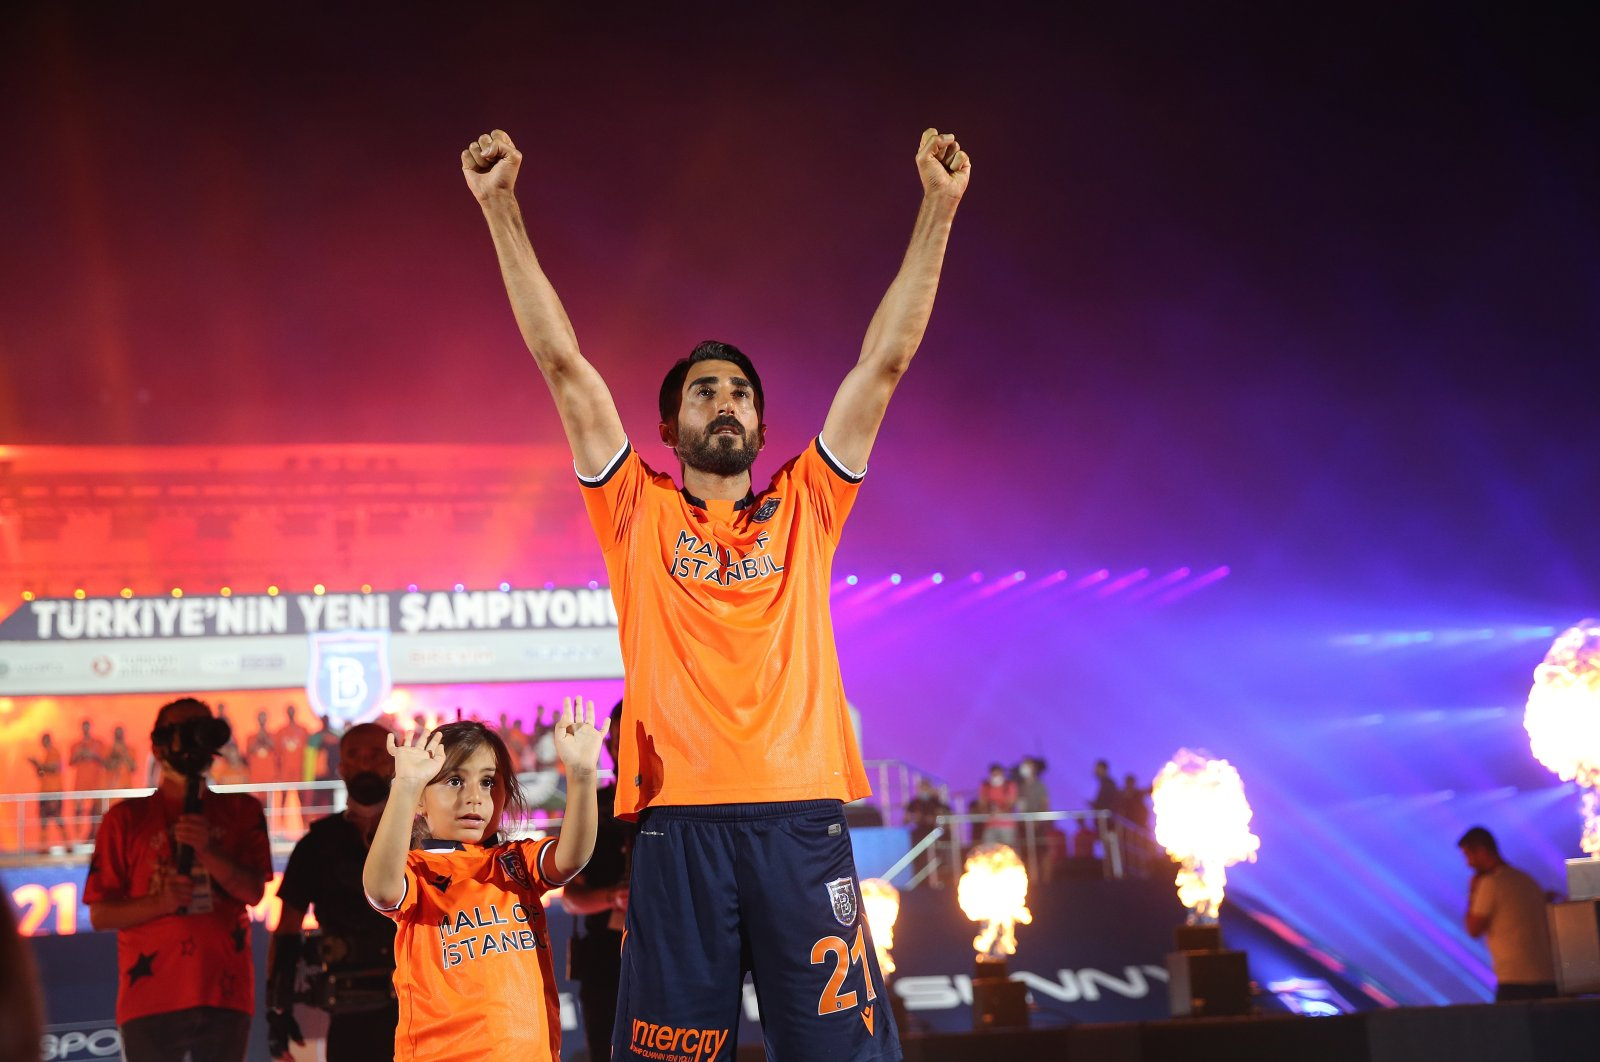 Mahmut Tekdemir of Başakşehir gestures during title celebration in Fatih Terim stadium, in Istanbul, Turkey, July 26, 2020. (AA Photo)